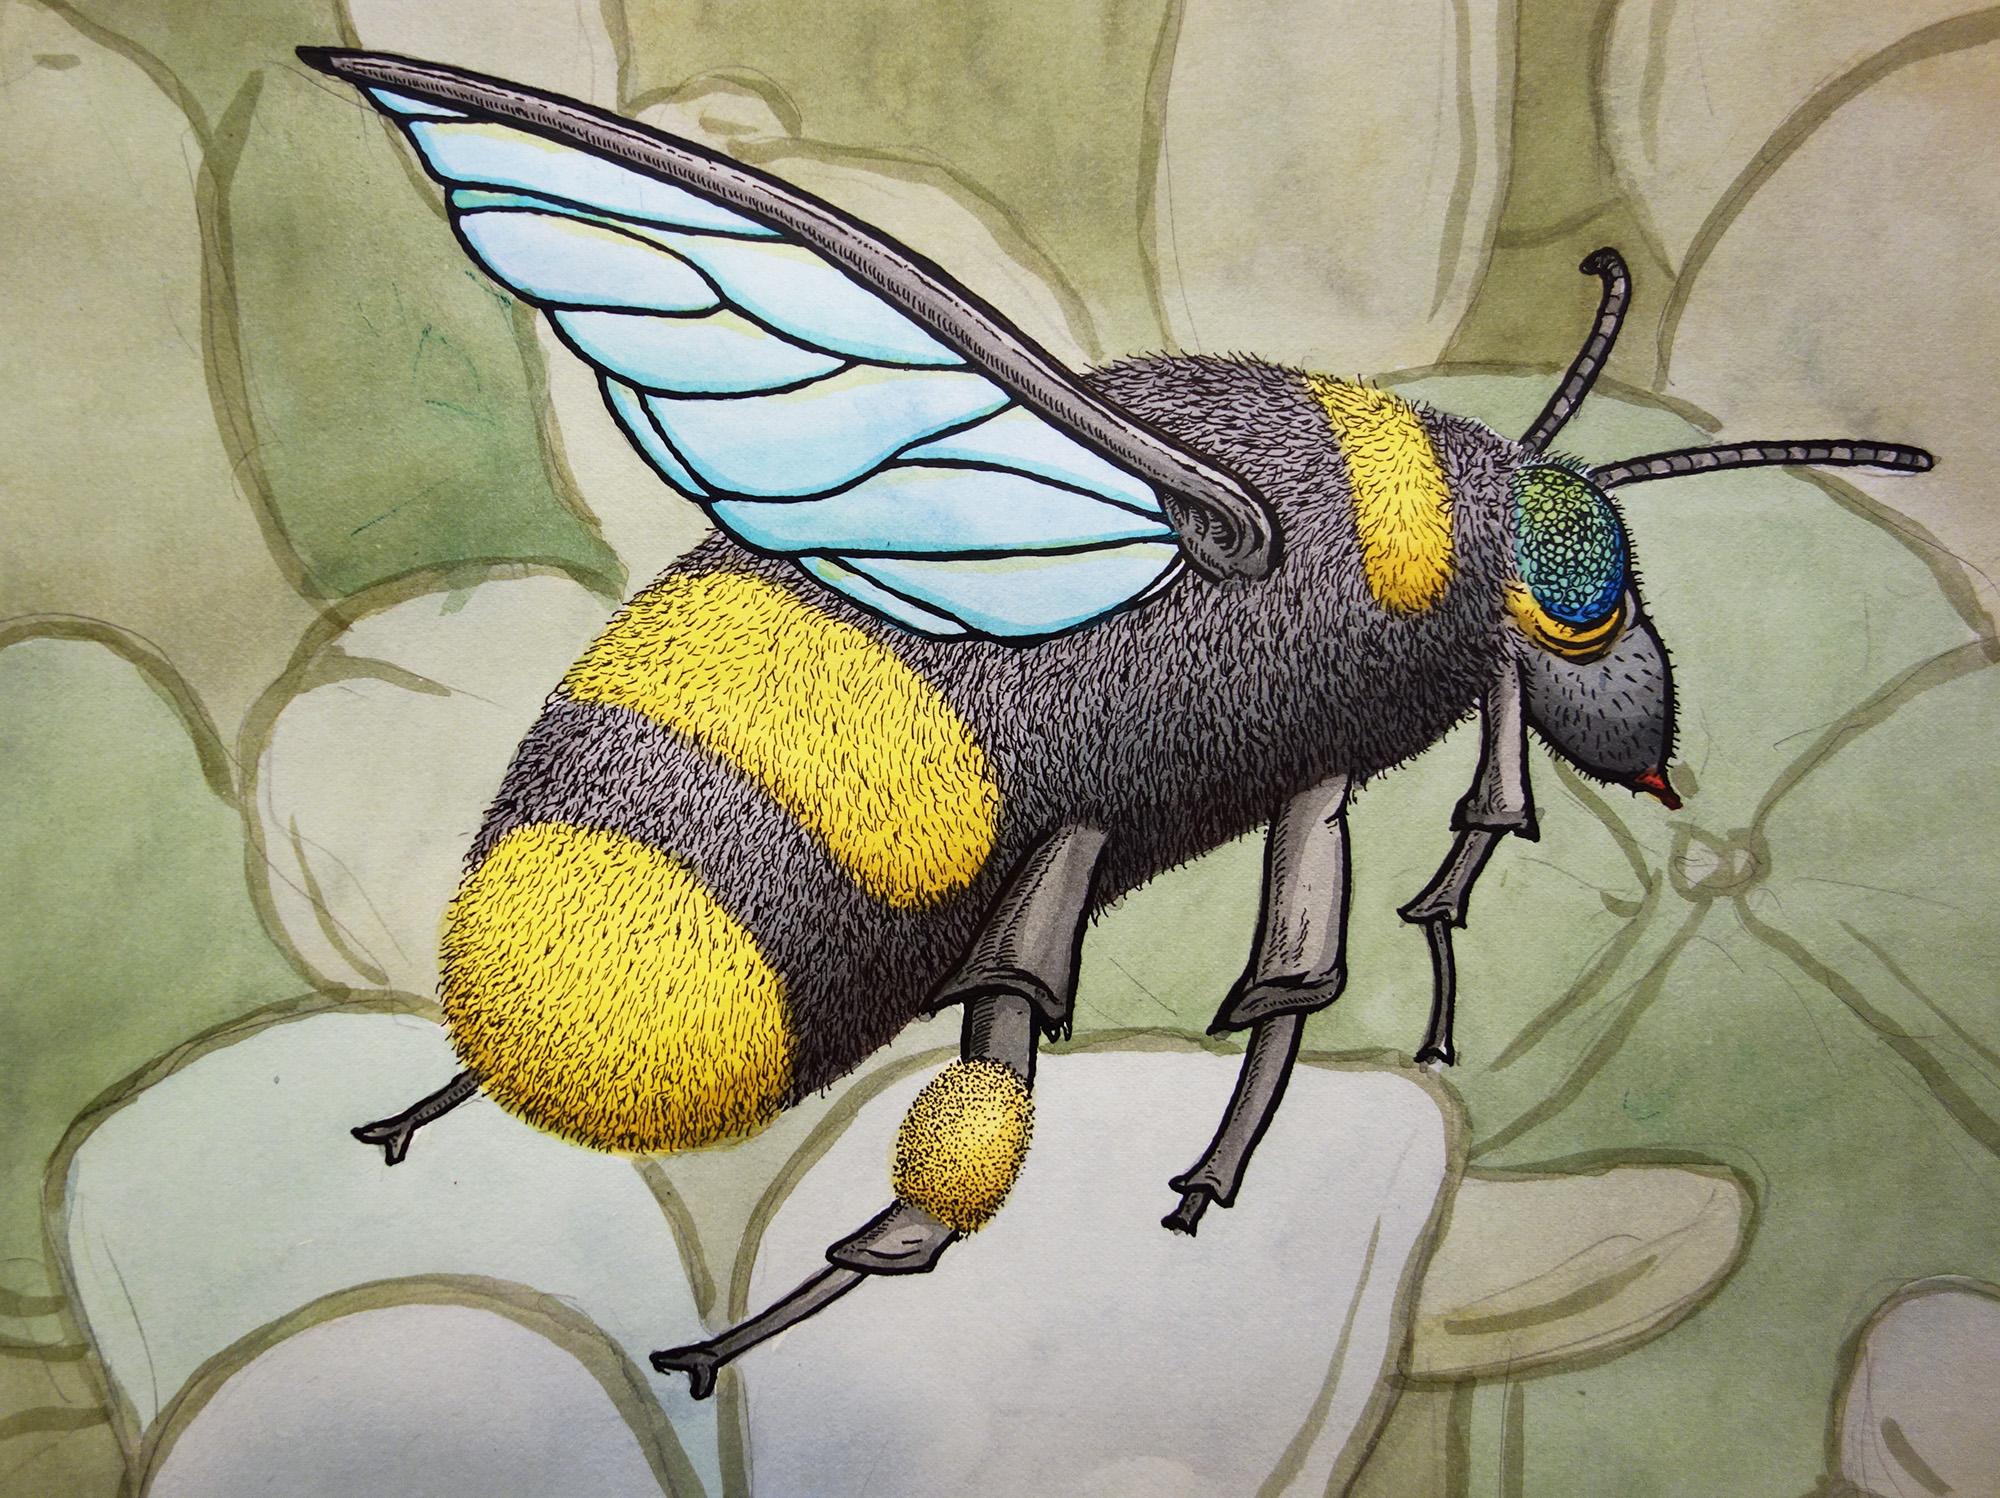 spin-wheel-bee-detail-web.jpg